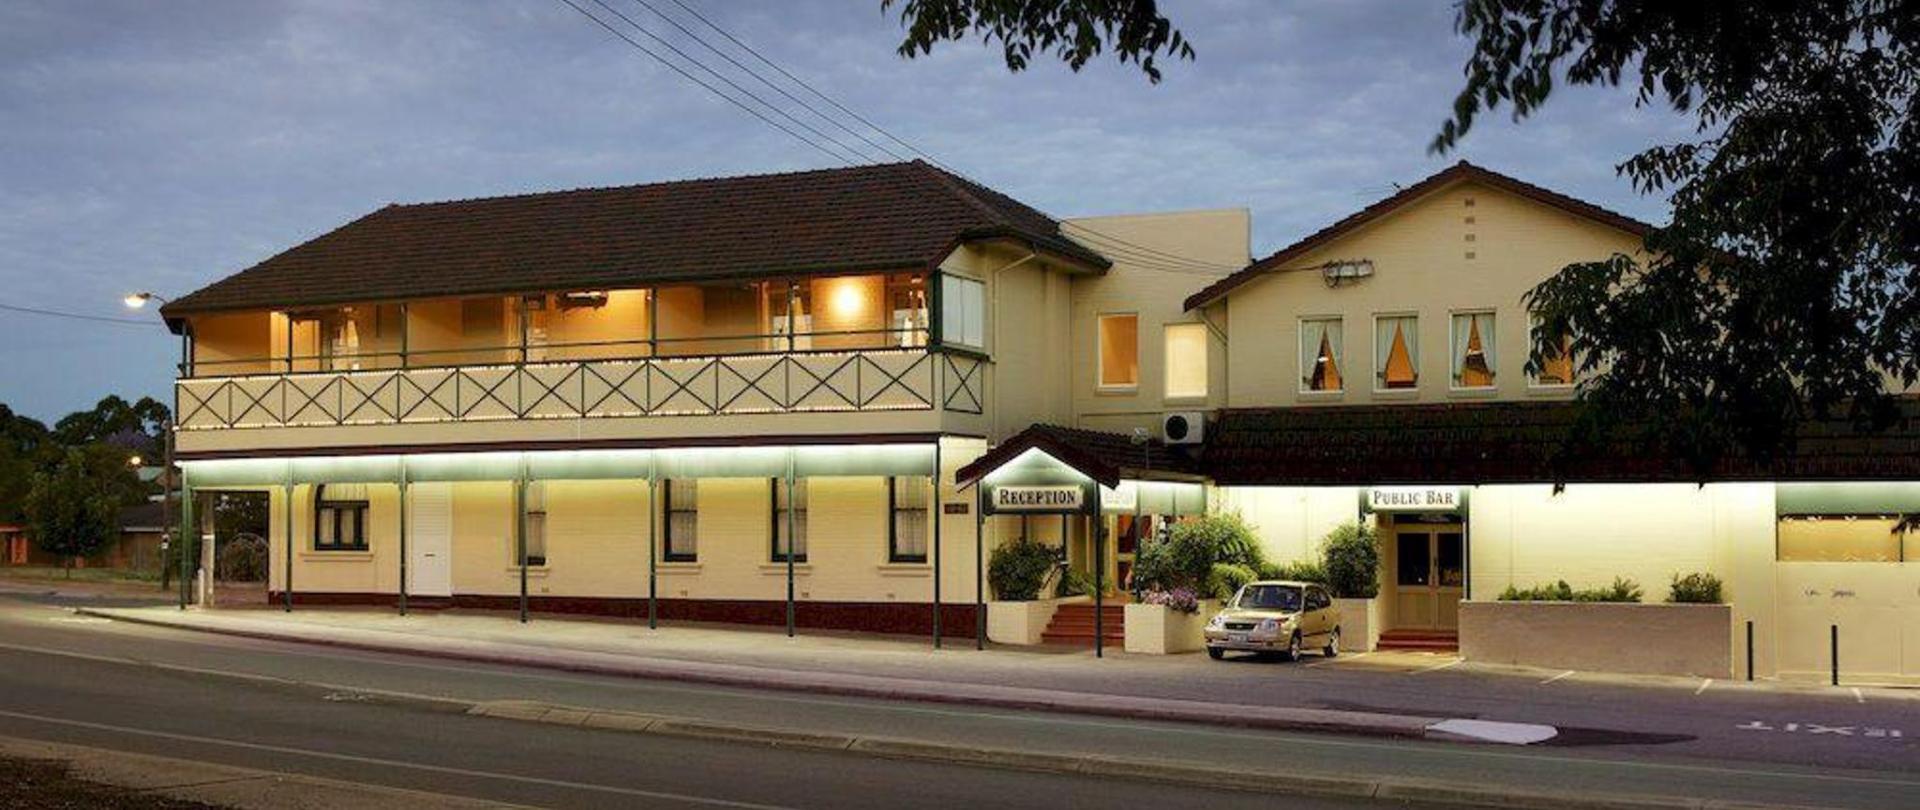 hotel-front.jpg